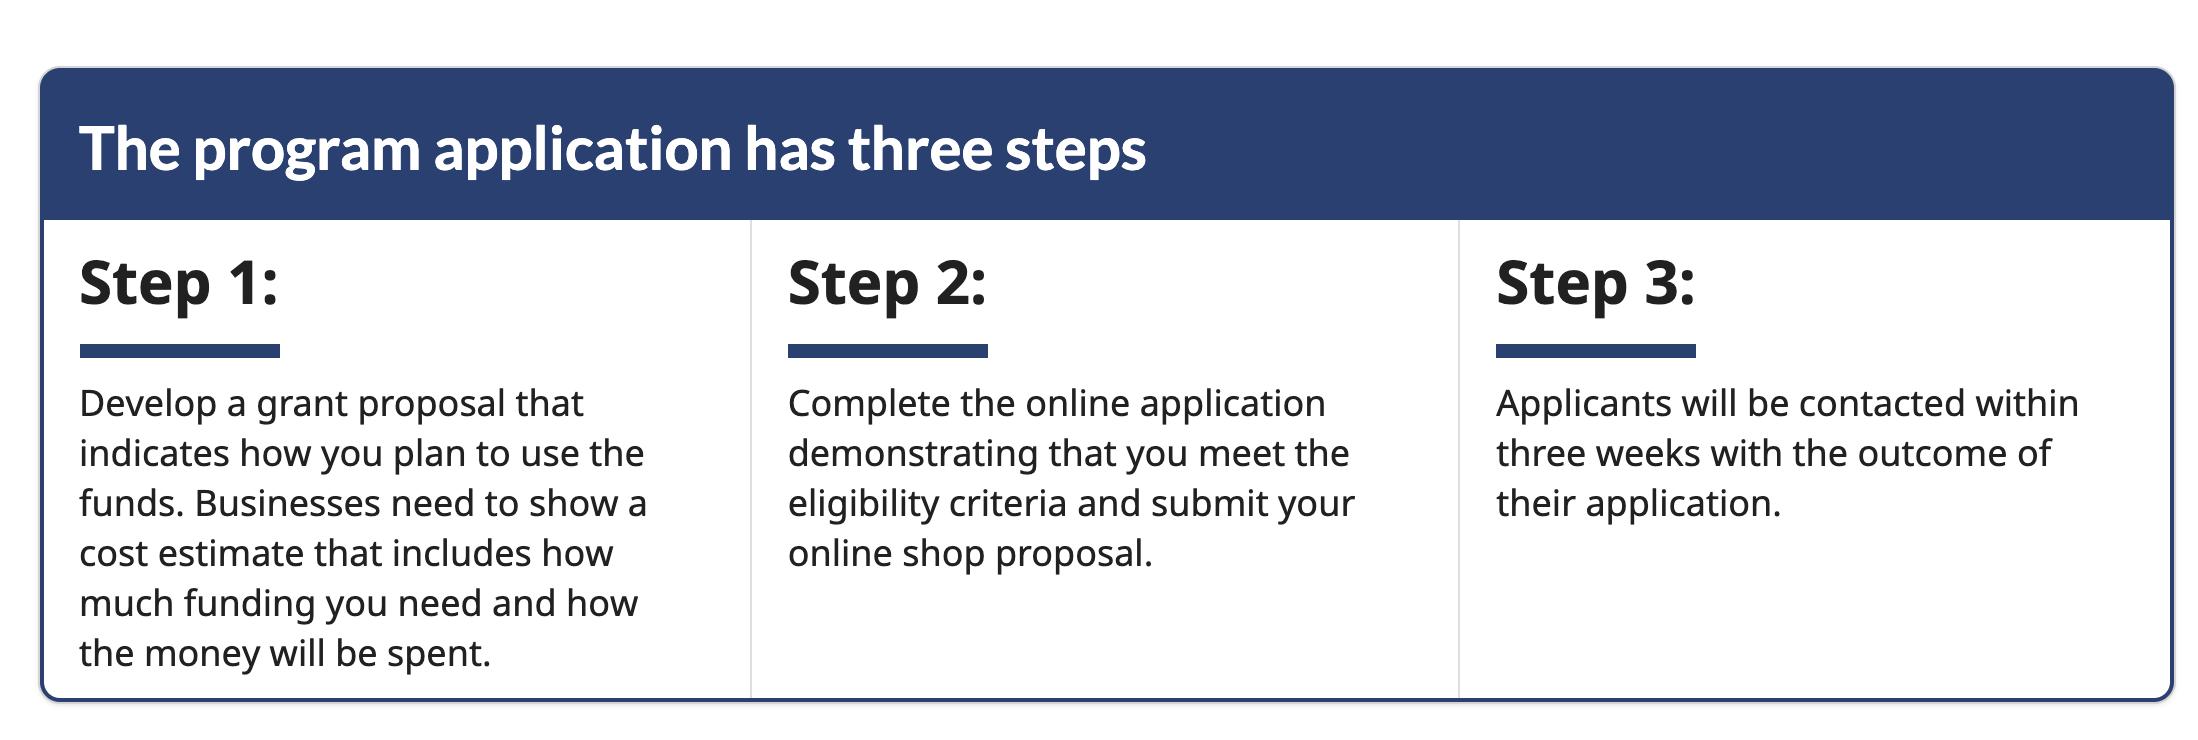 steps to apply